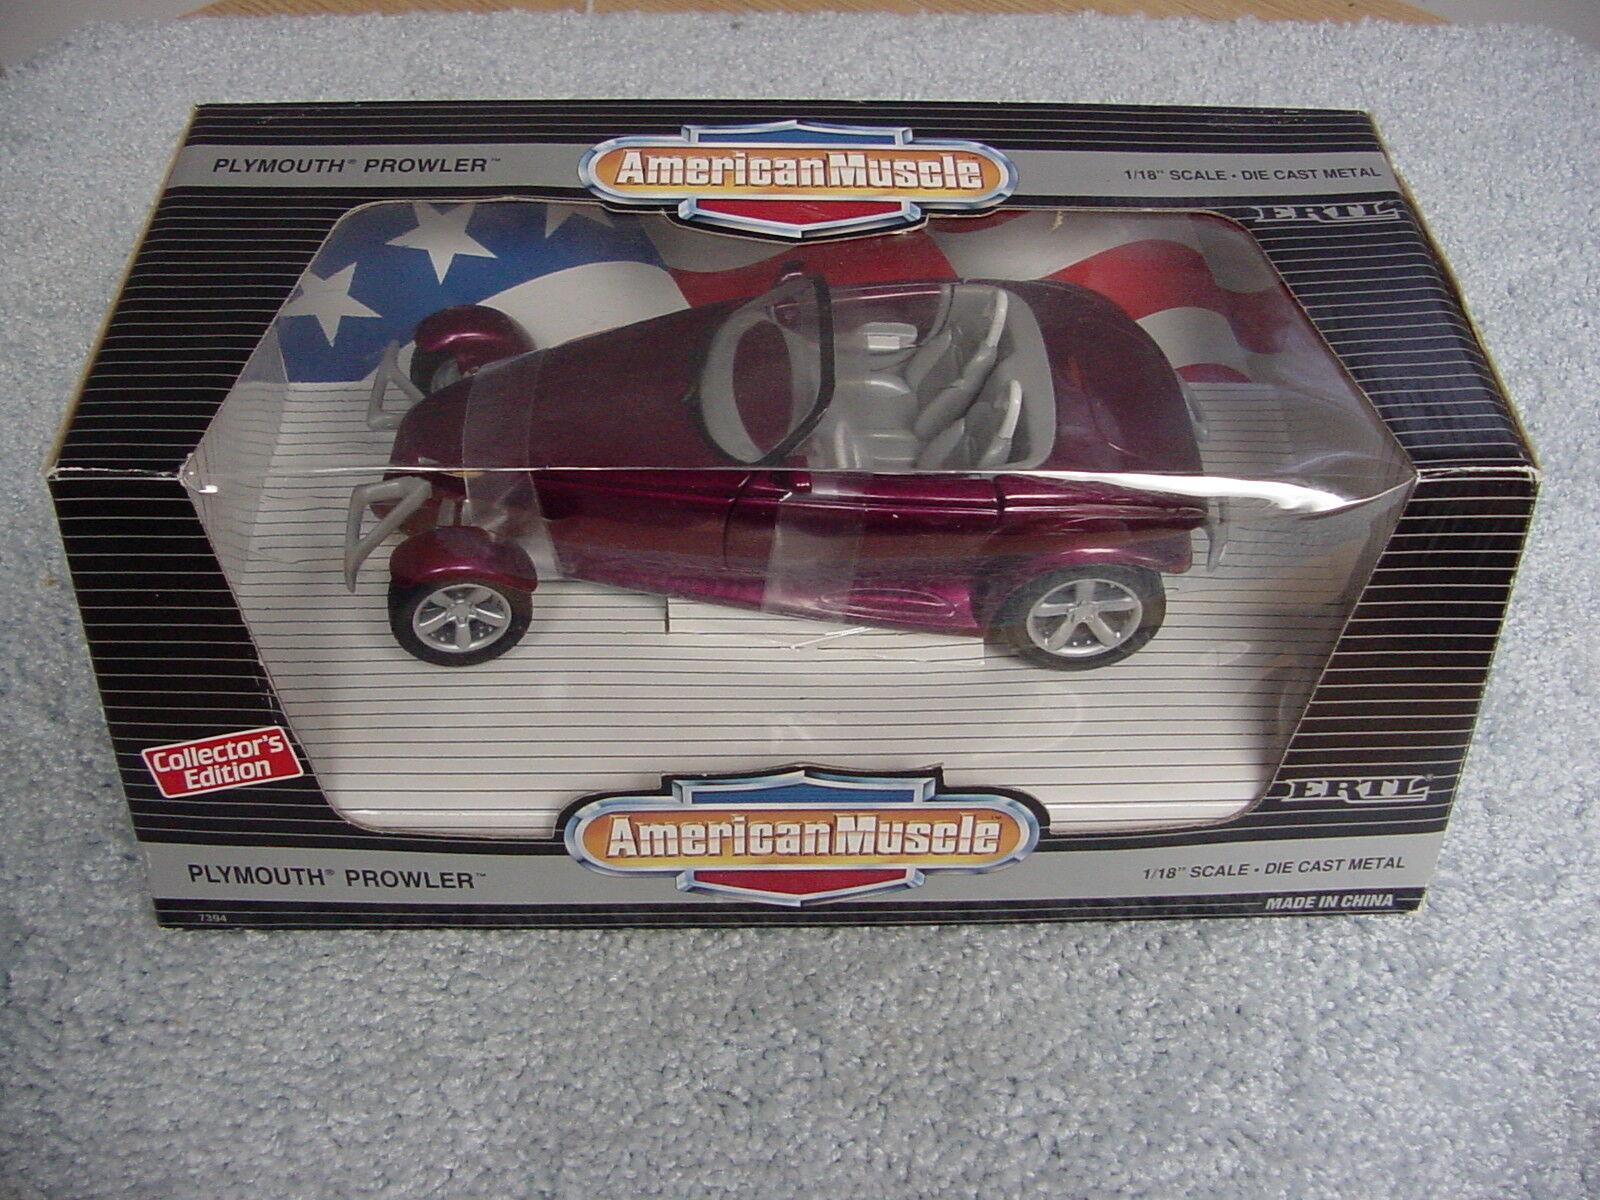 marca famosa Ertl 1 18 Plymouth Prowler Candy Candy Candy Magenta American Muscle Coche entidades cósmico  a la venta